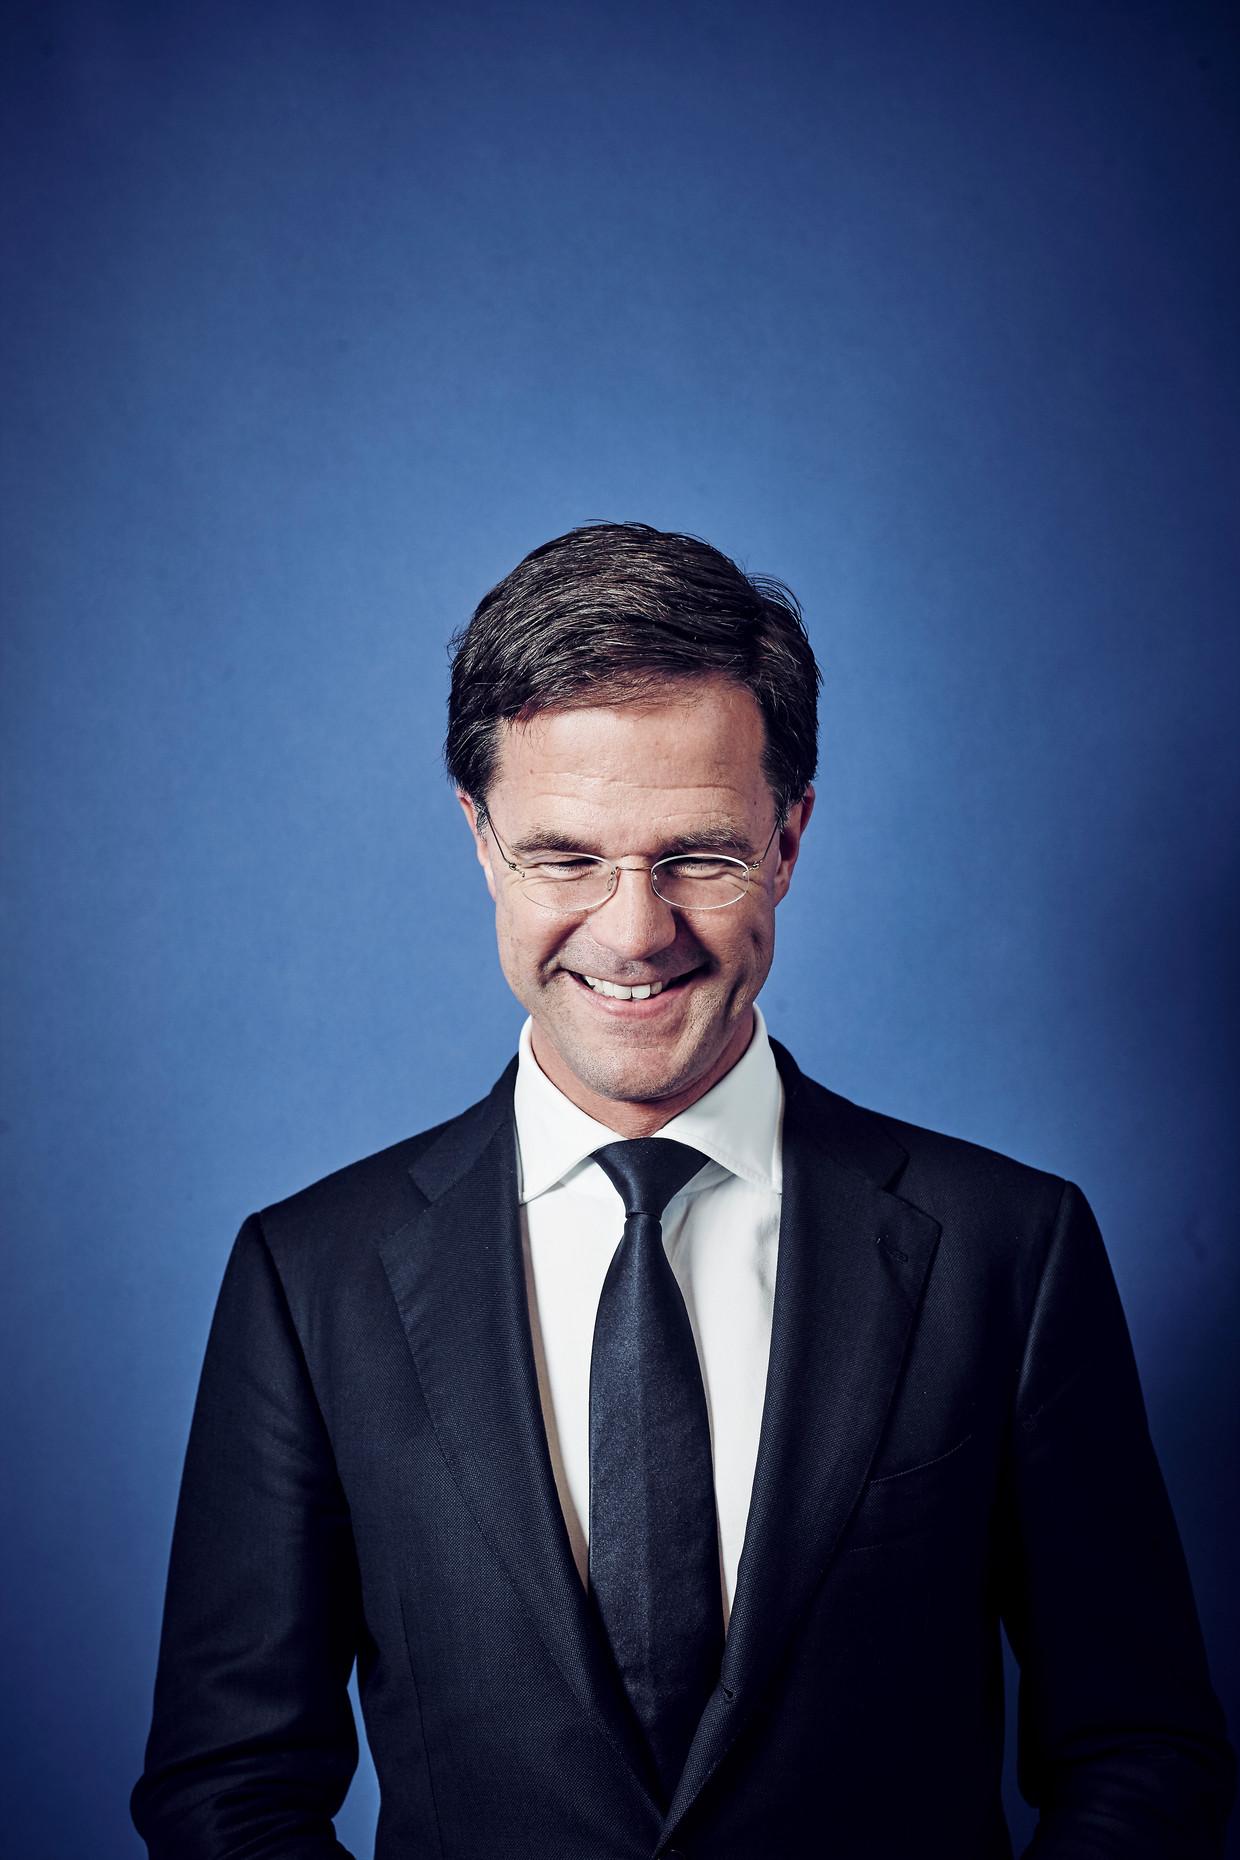 Mark Rutte is tien jaar premier van ons land en daarmee een van de langstzittende ooit. Beeld Iris Planting/Lumen